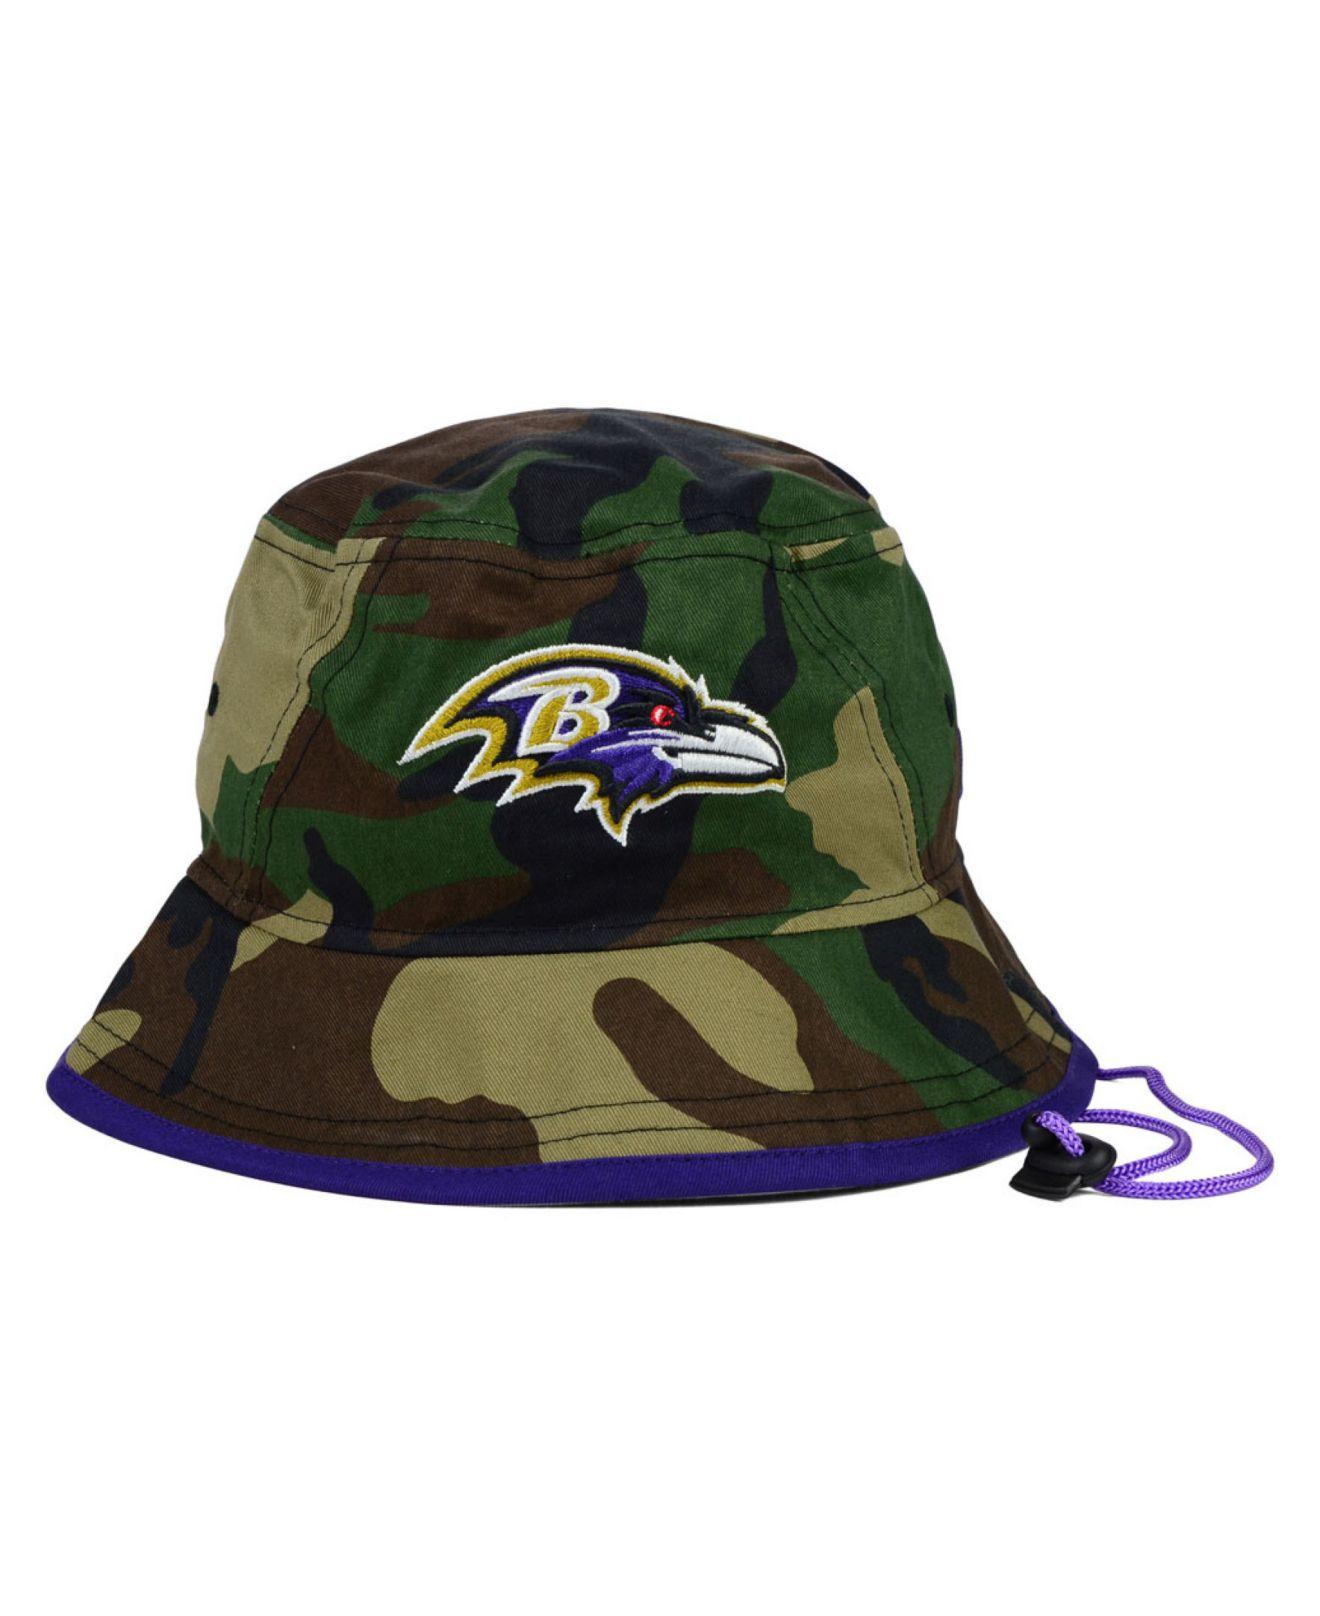 0c09b14241cf1 ... coupon for lyst ktz baltimore ravens camo pop bucket hat in green for  men 254fd 2280e ...